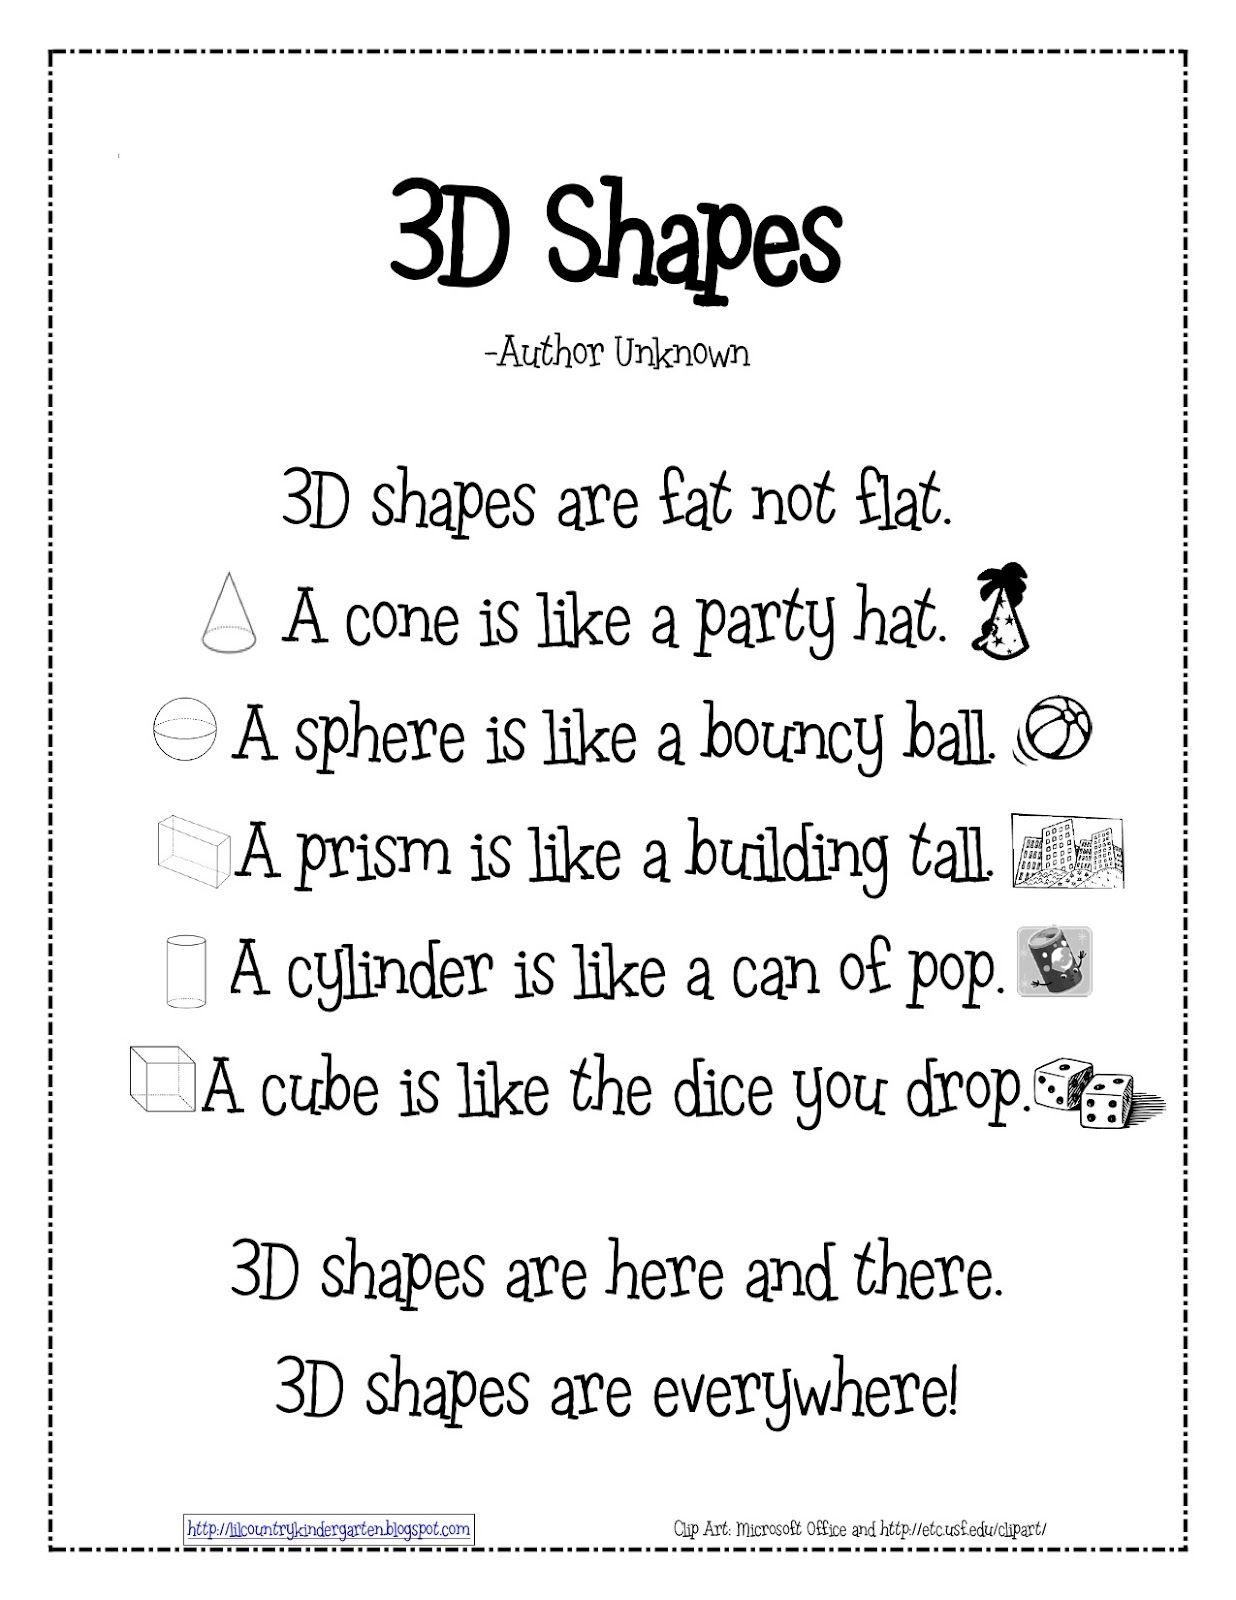 Kinder Learning Garden Blog Teaching 3d Shapes